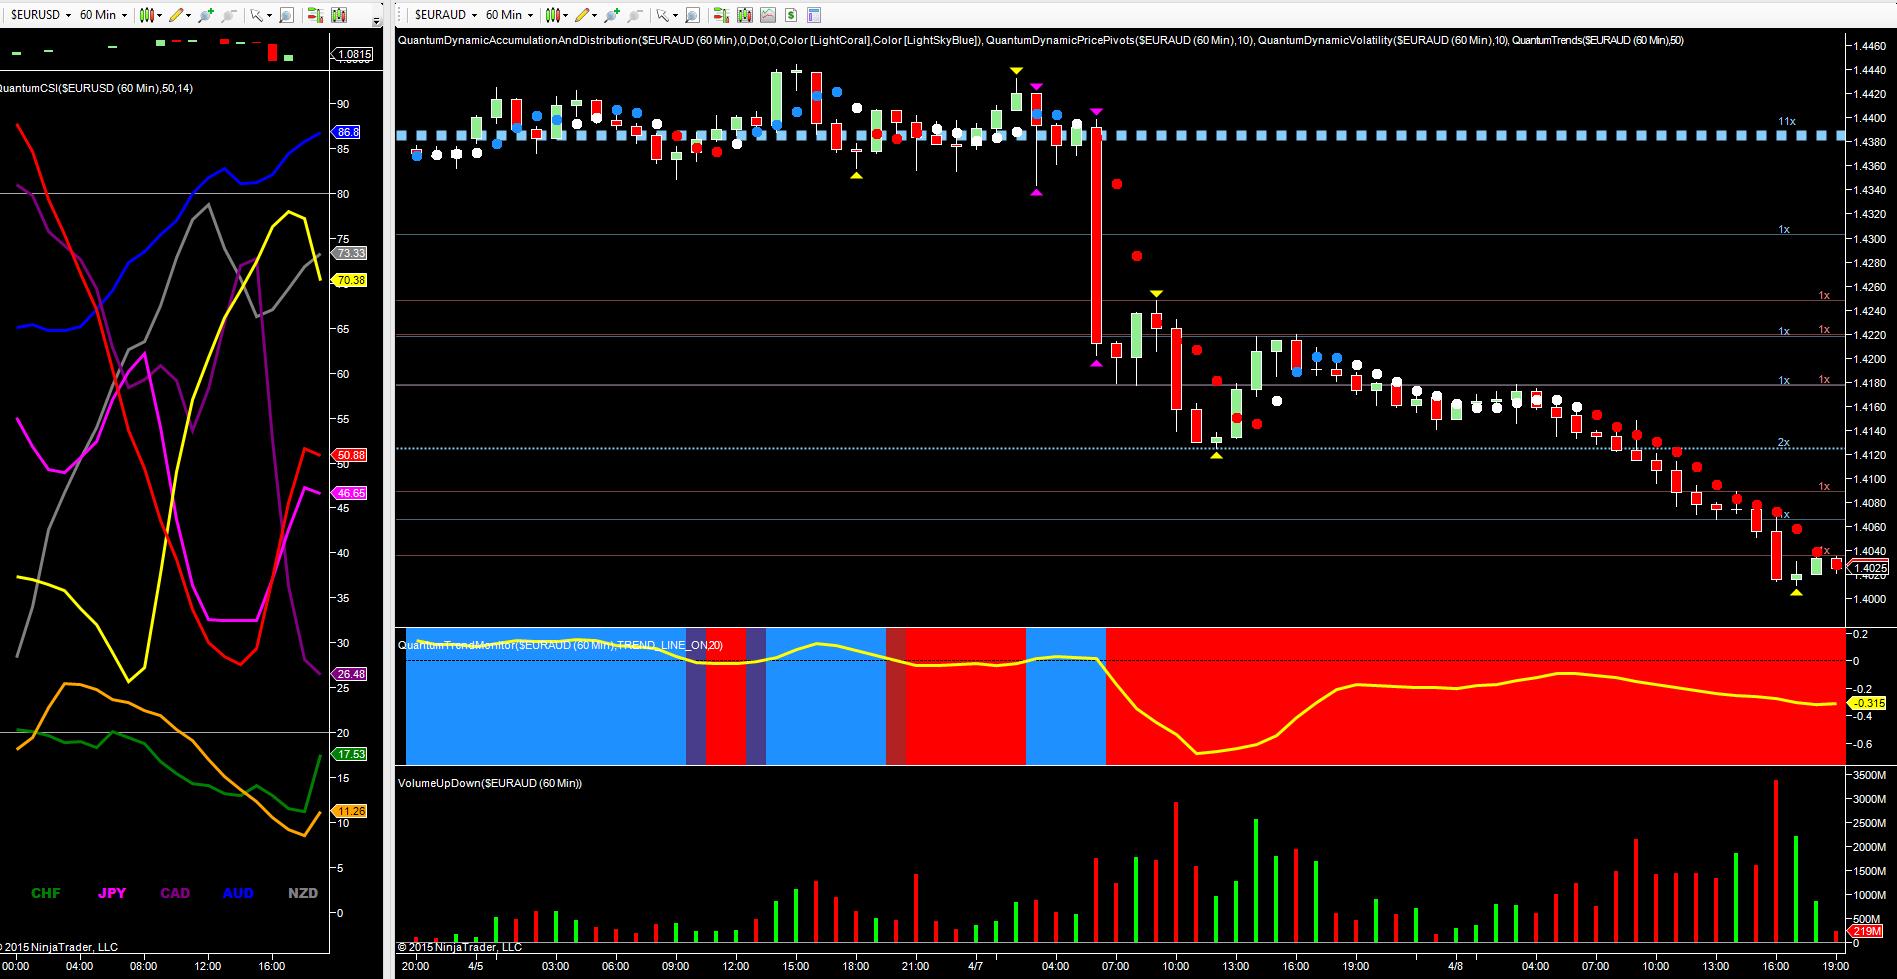 EUR/AUD - 60 minute chart